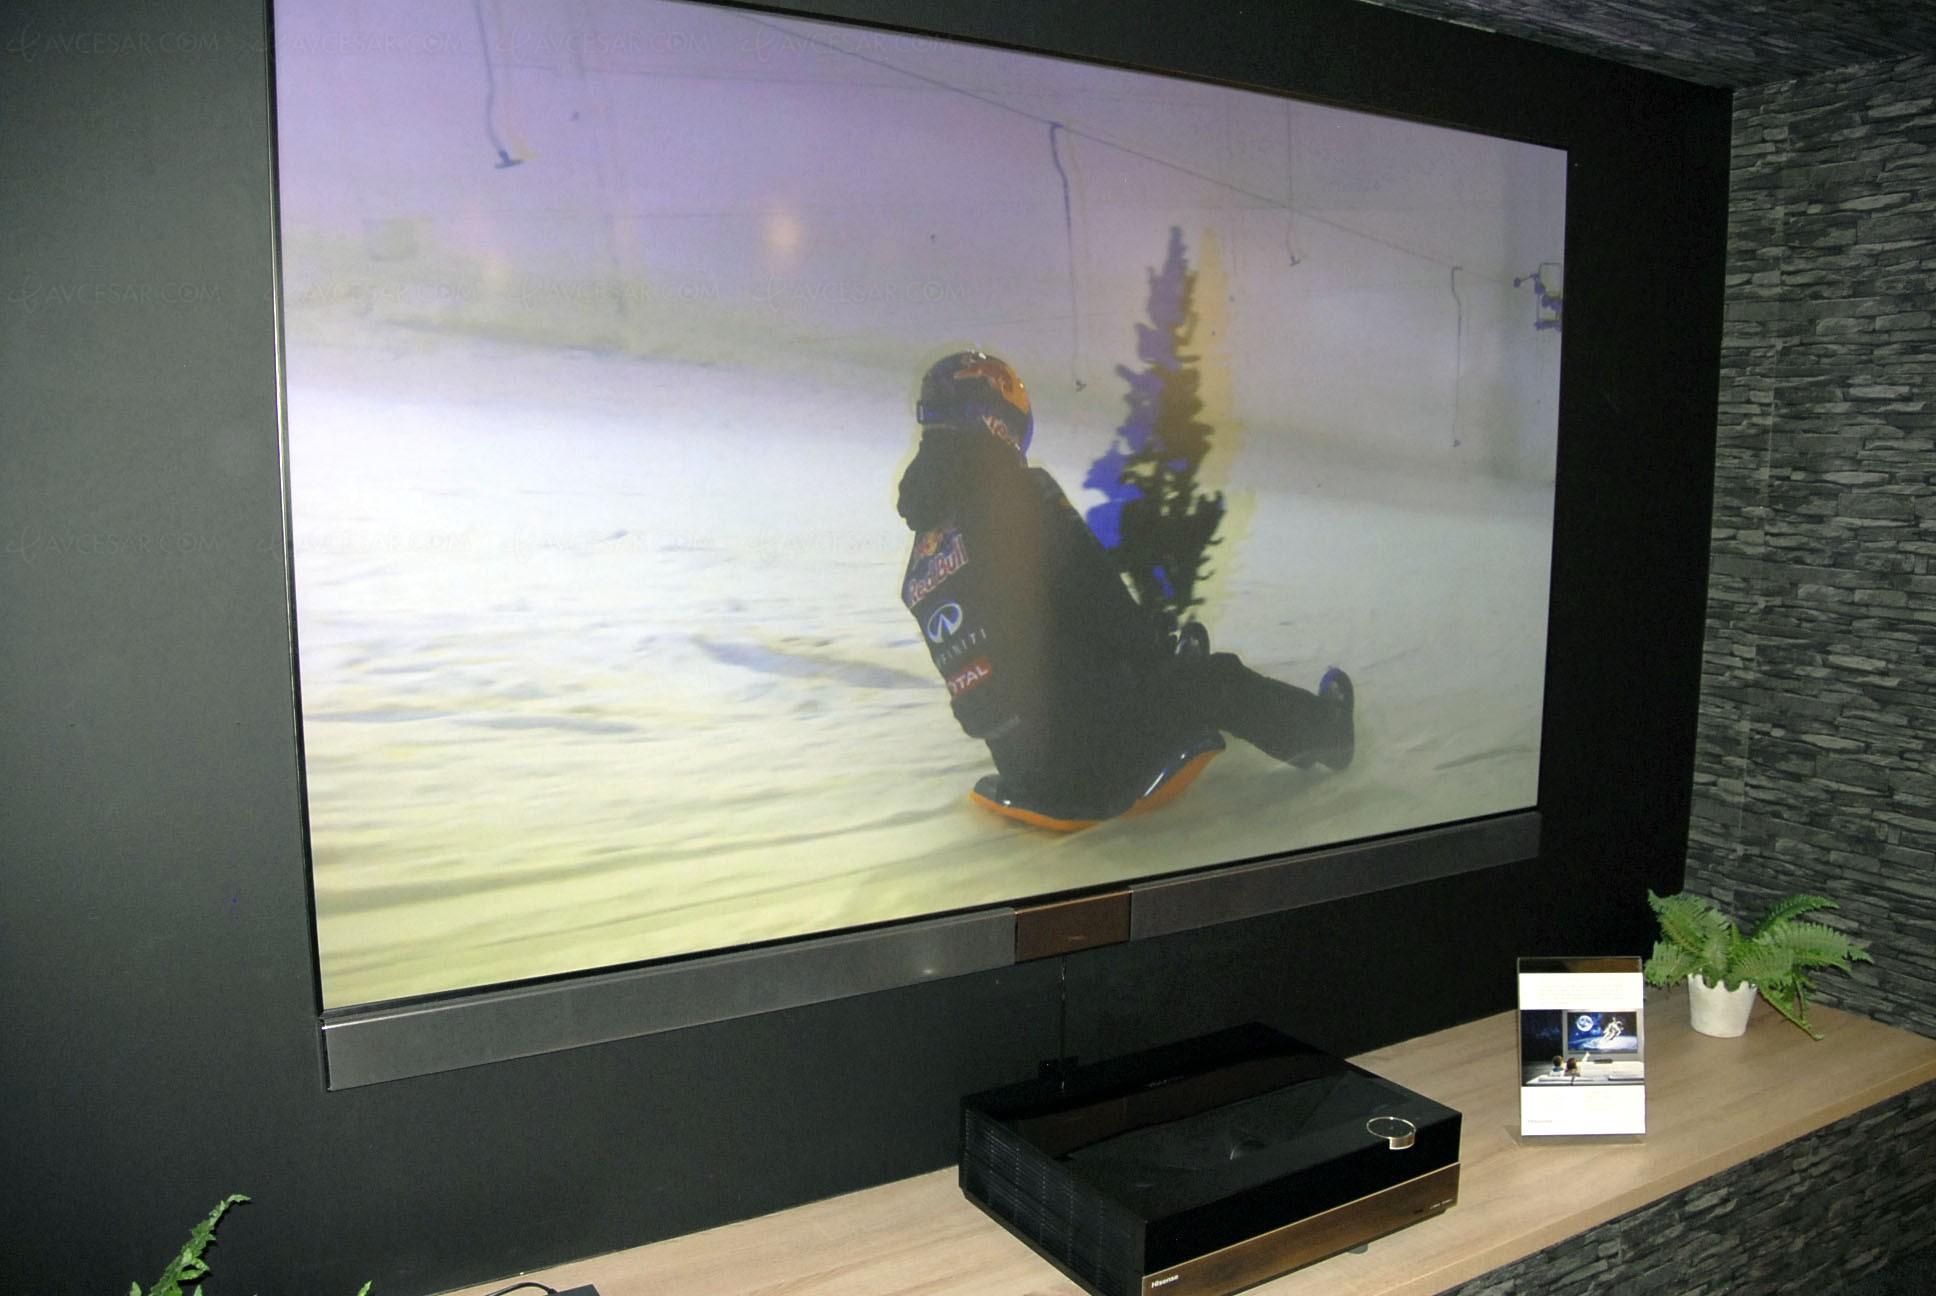 Videoprojecteur Avec Tuner Tv ifa 15 > hisense vidaa max 2 : vidéoprojecteur/tv laser